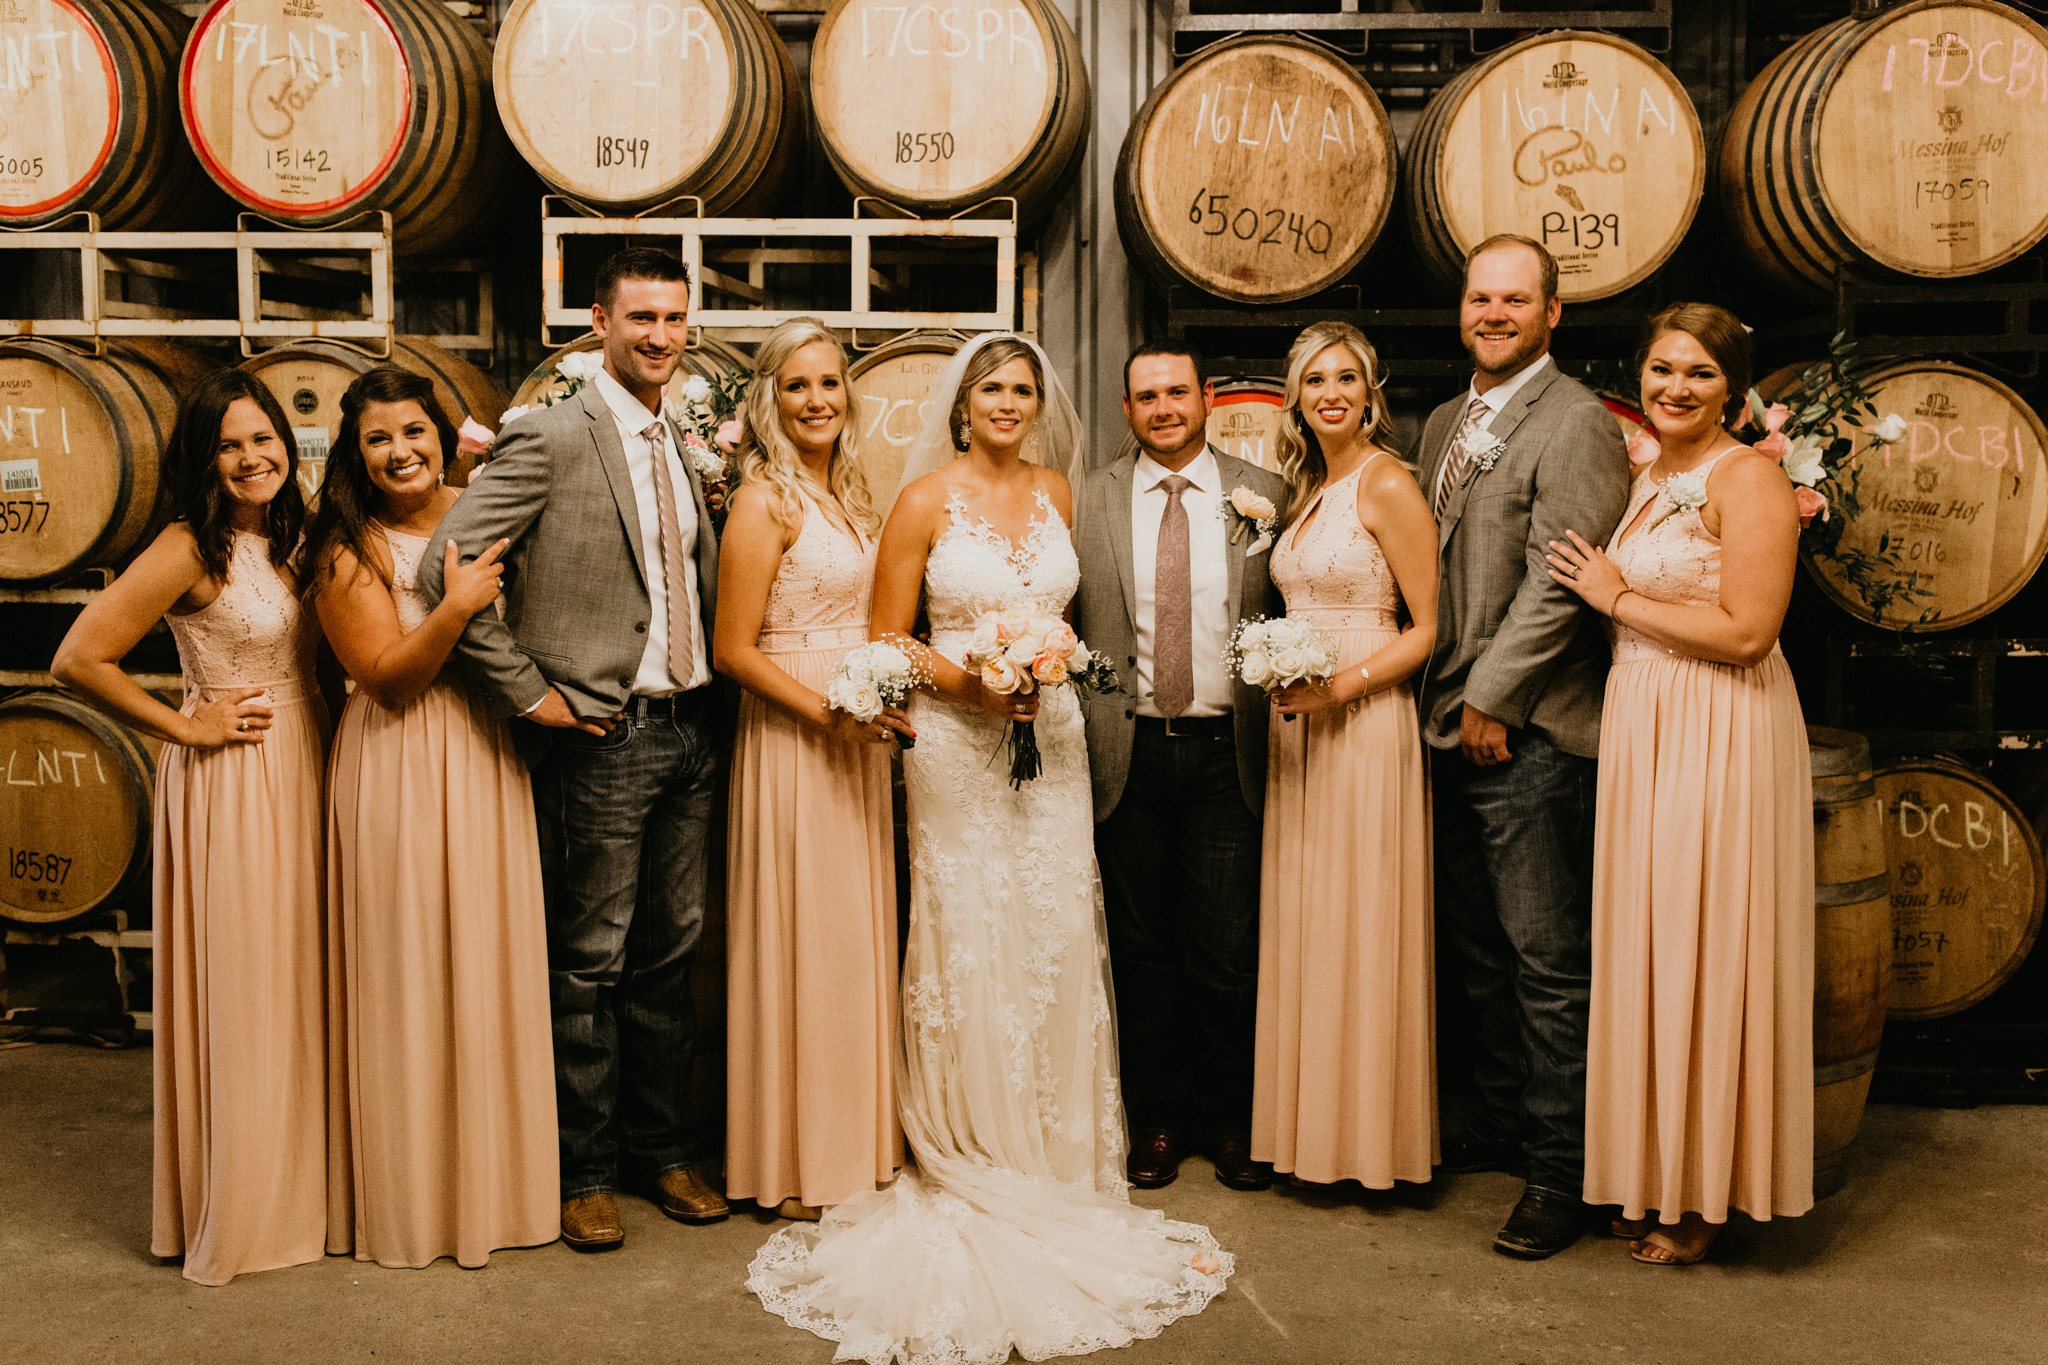 Messina Hof Winery Texas Wedding-29.jpg